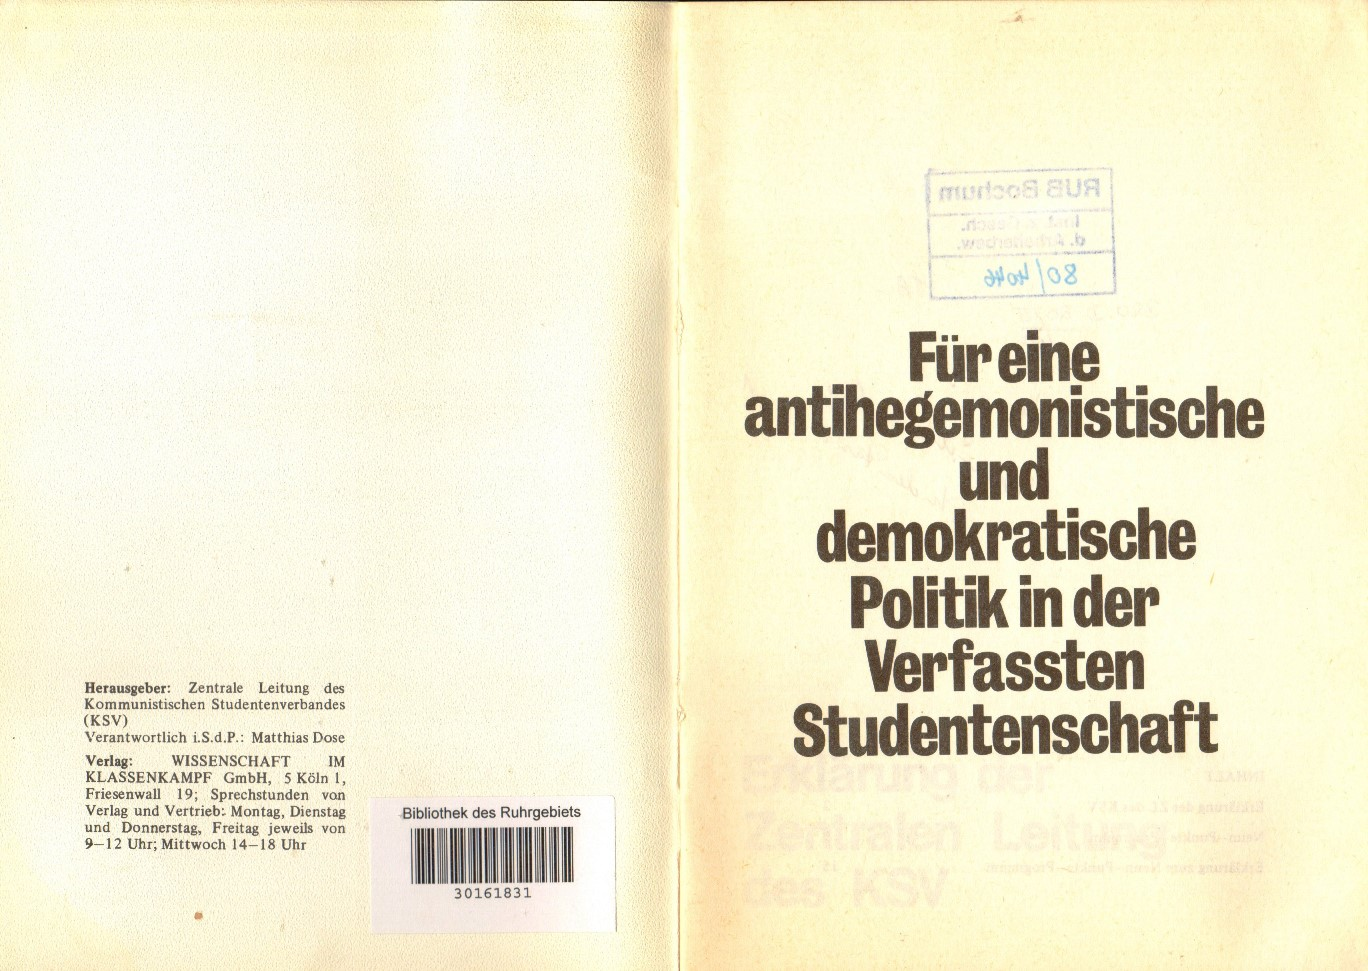 KSV_1976_Verfasste_Studentenschaft_02